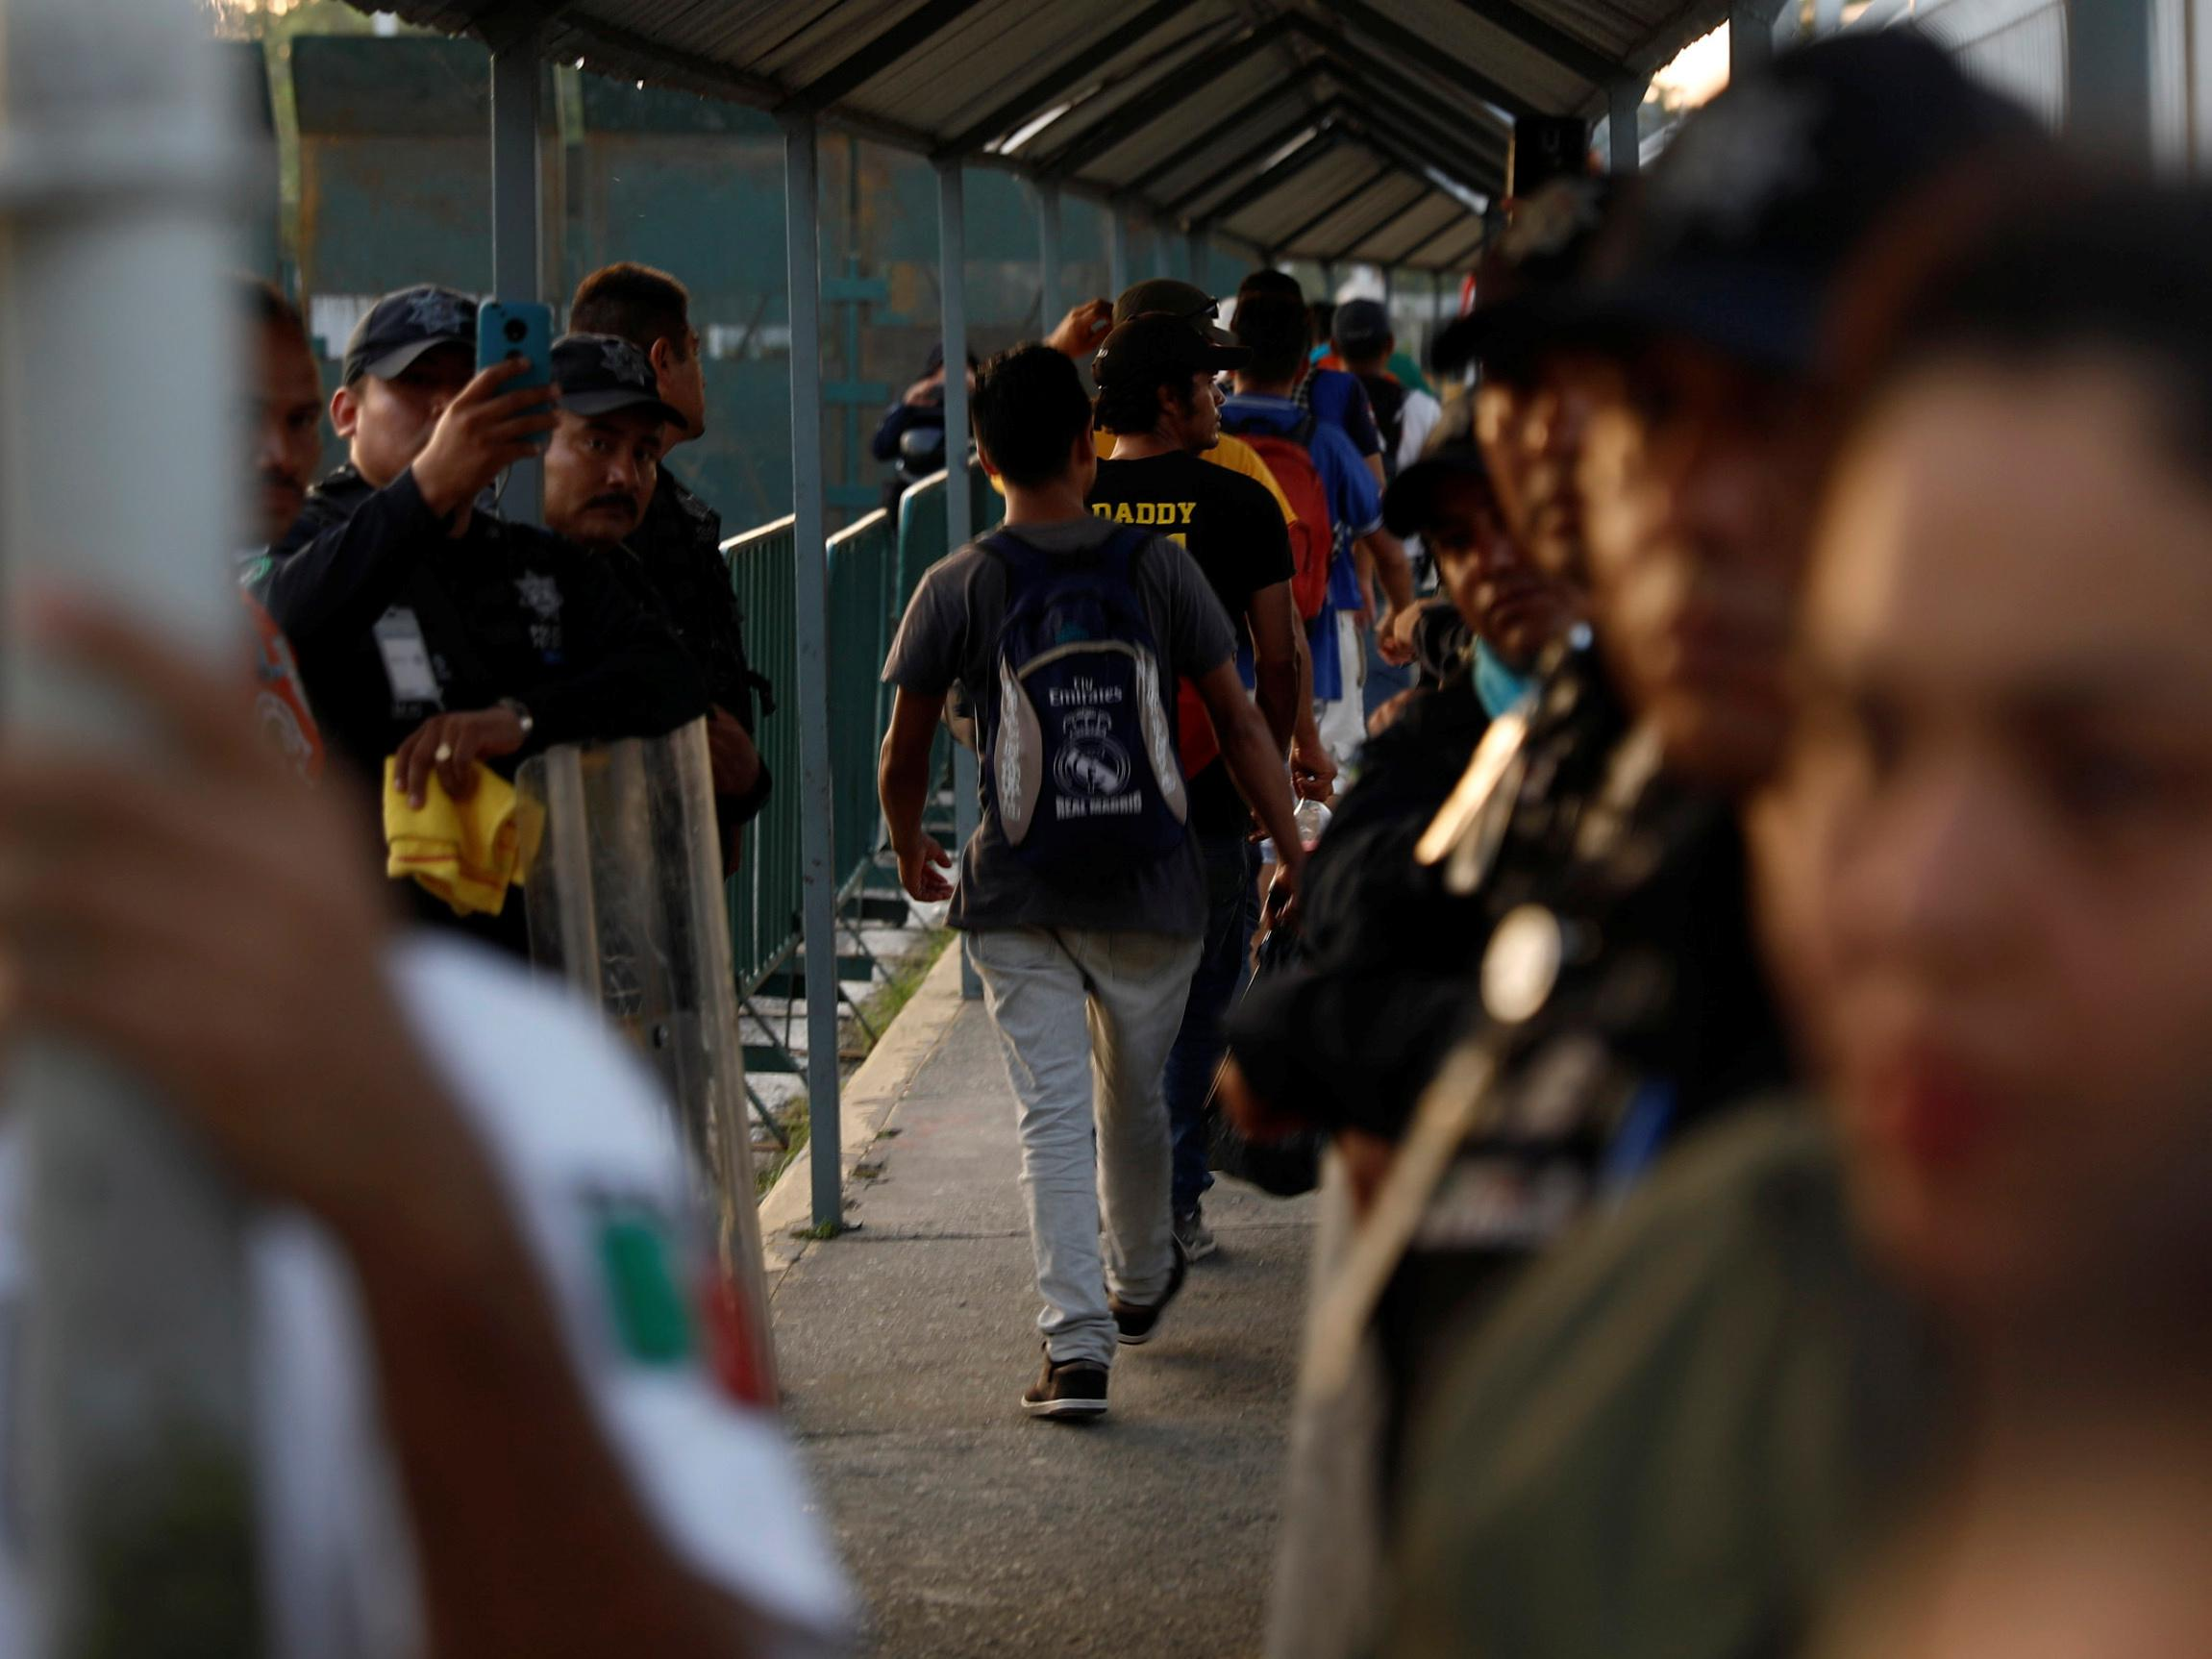 Pentagon sends 800 troops to US-Mexico border as migrant caravan advances